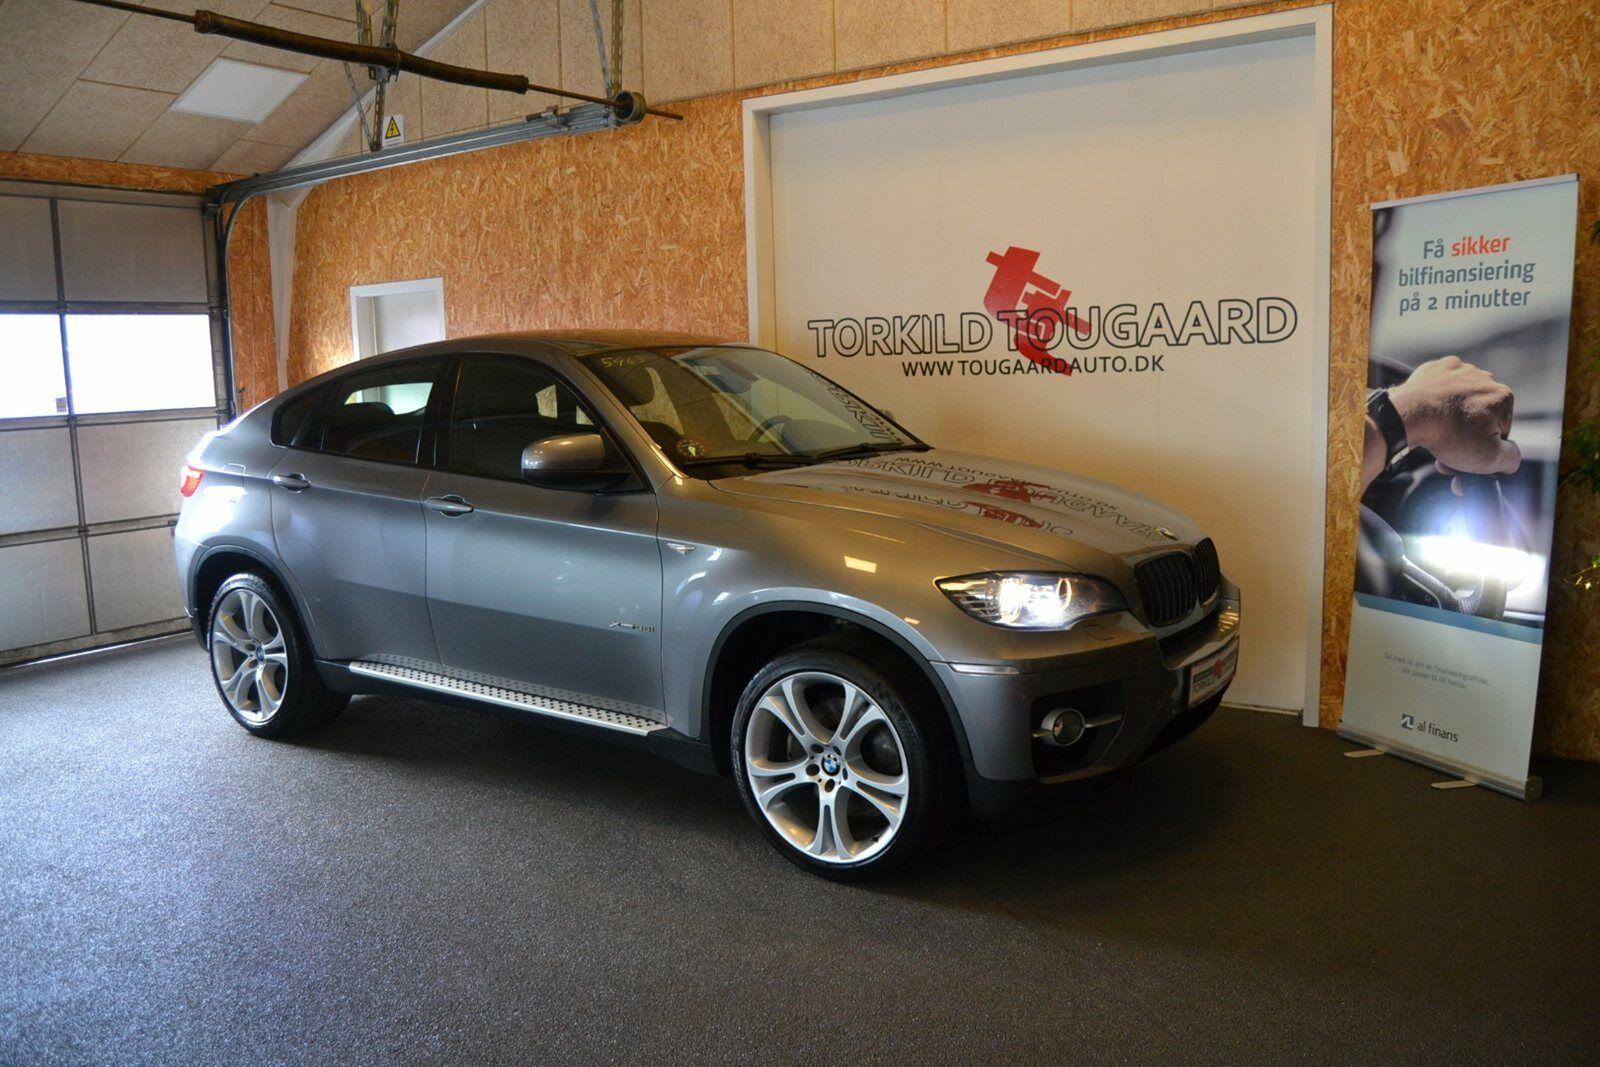 BMW X6 3,0 xDrive35i aut. 5d - 359.800 kr.